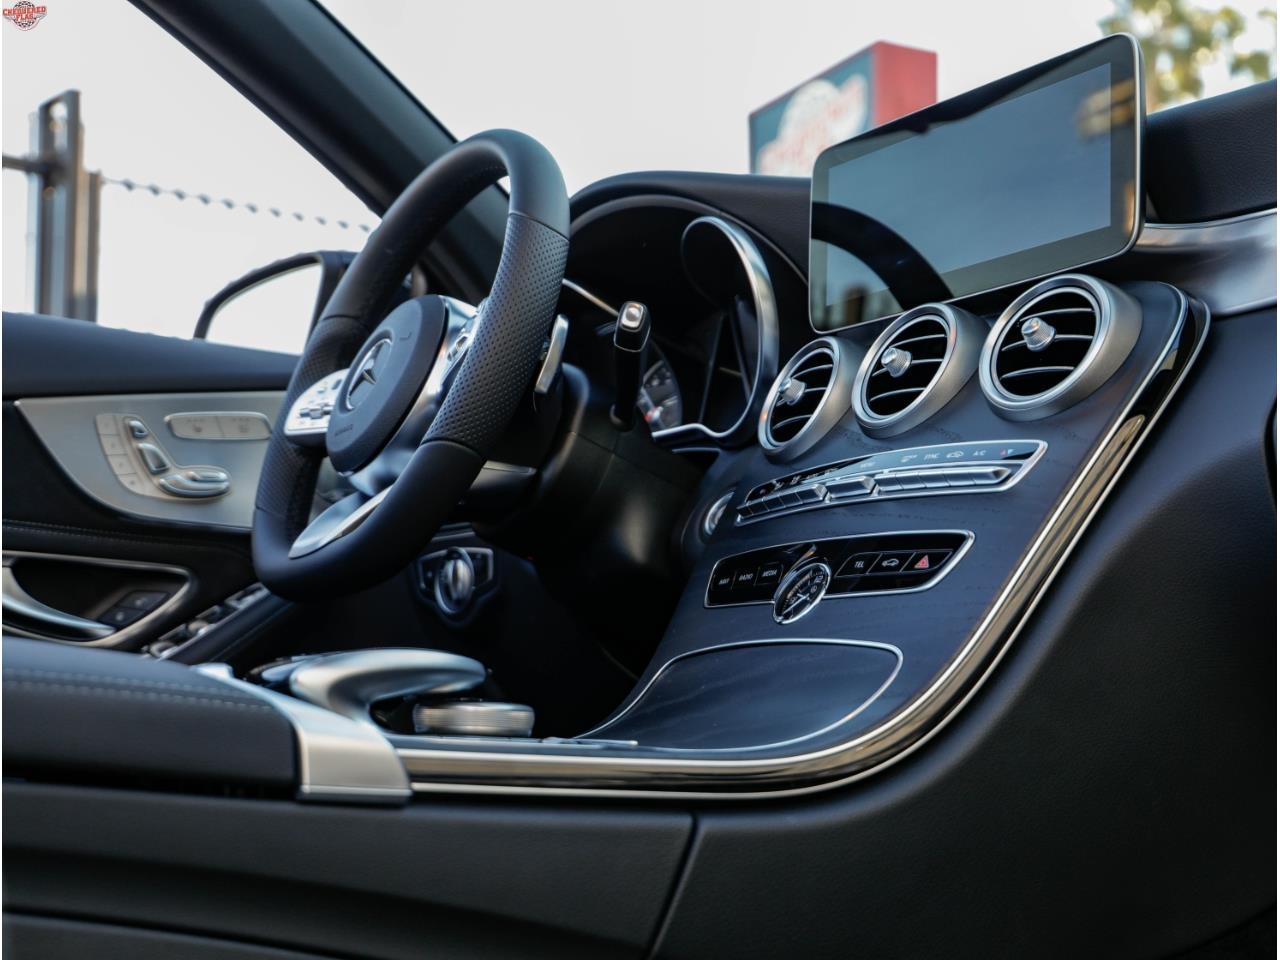 2019 Mercedes-Benz C-Class (CC-1177657) for sale in Marina Del Rey, California